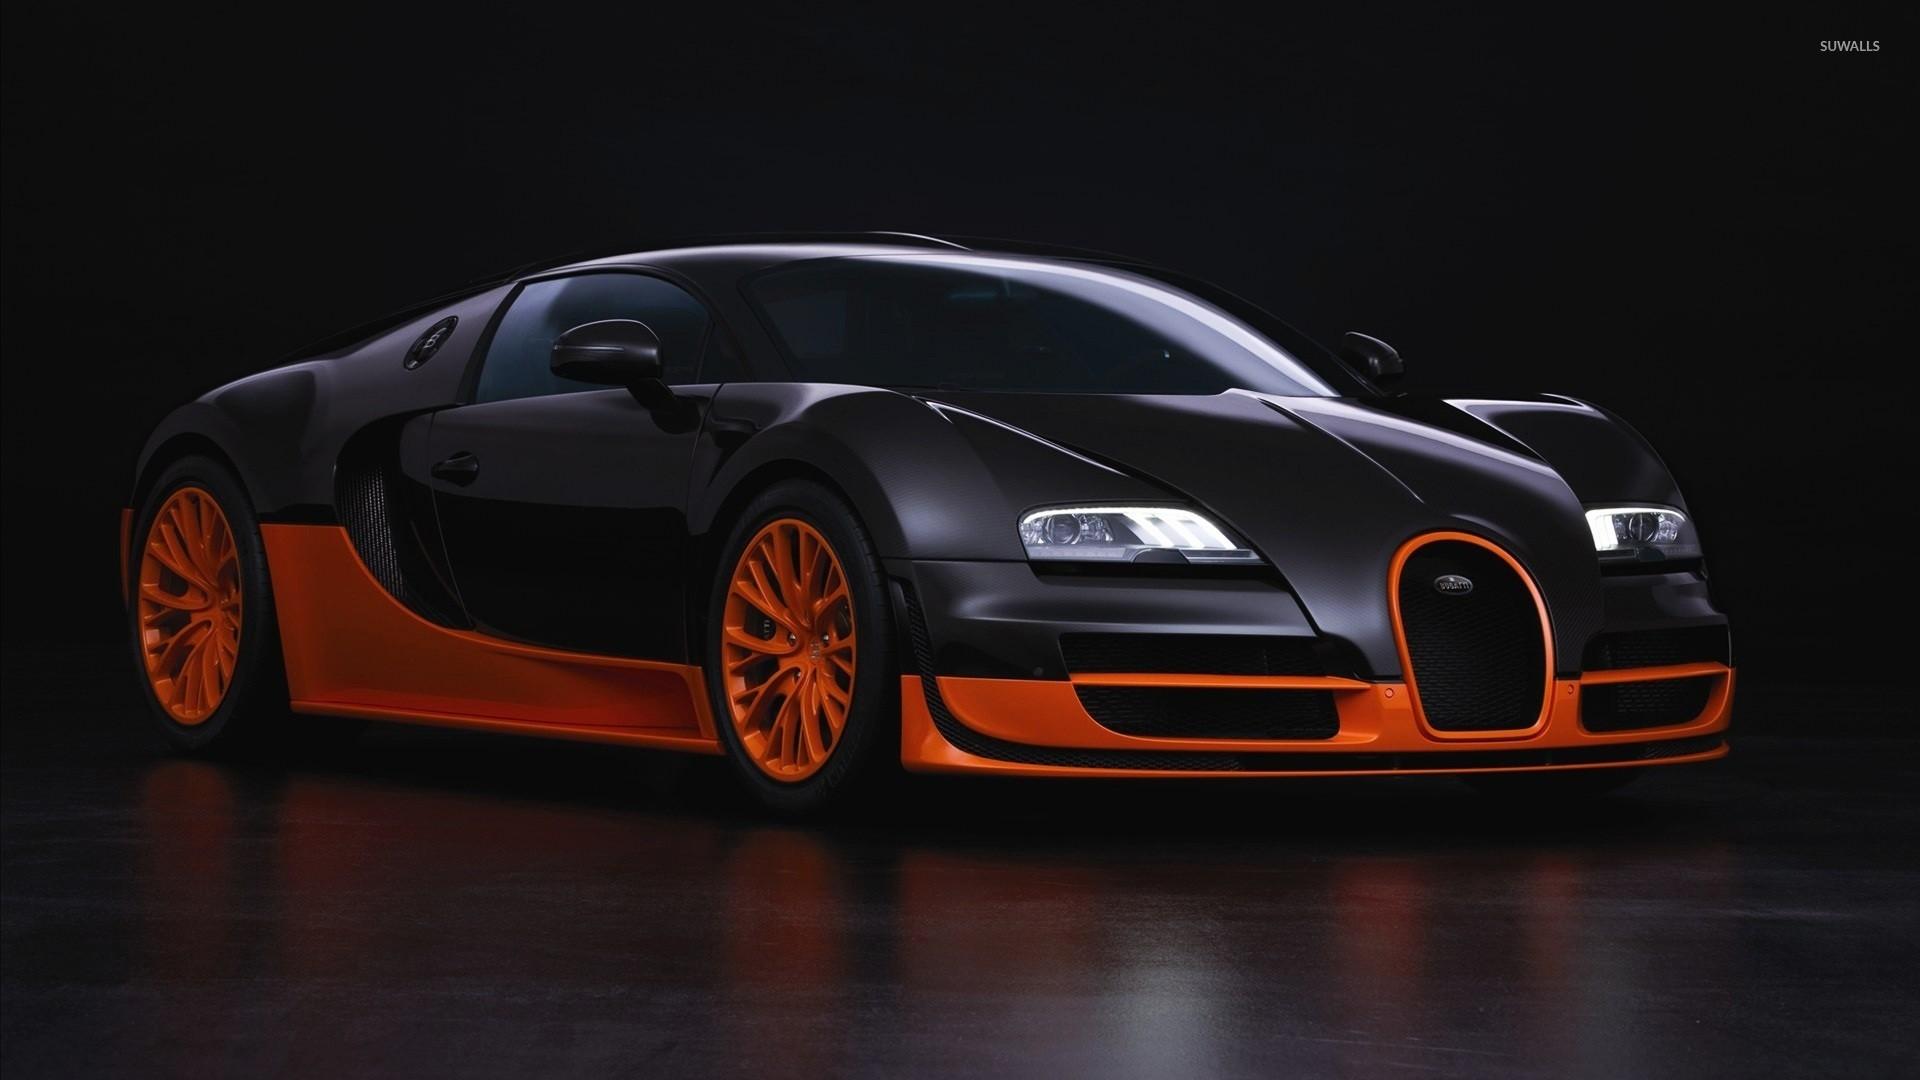 2000x1125 Bugatti Chiron Sport Car Windows 8 Wallpaper